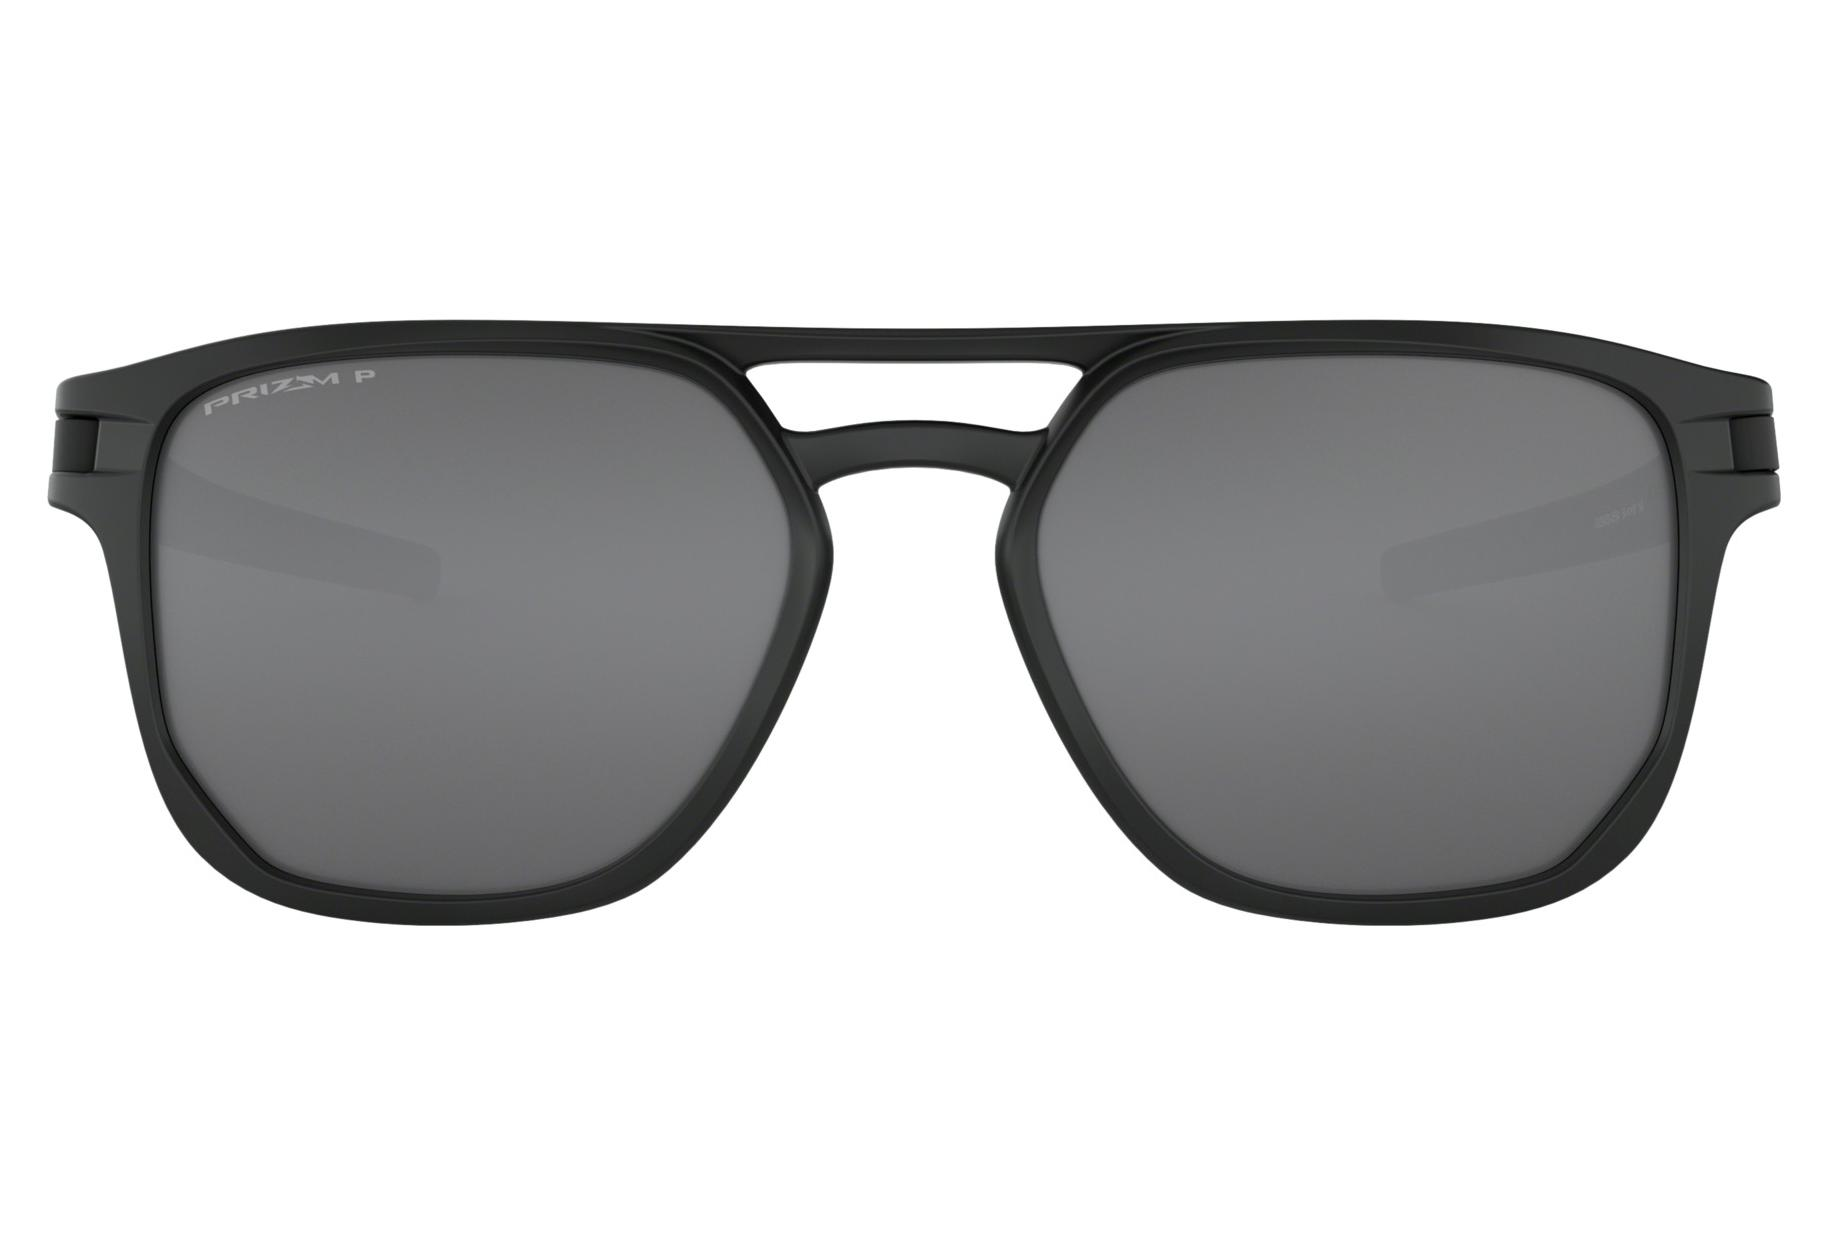 bce5ba06f7 Oakley Sunglasses Latch Bata Prizm Black Polarized / Ref. OO9436 ...